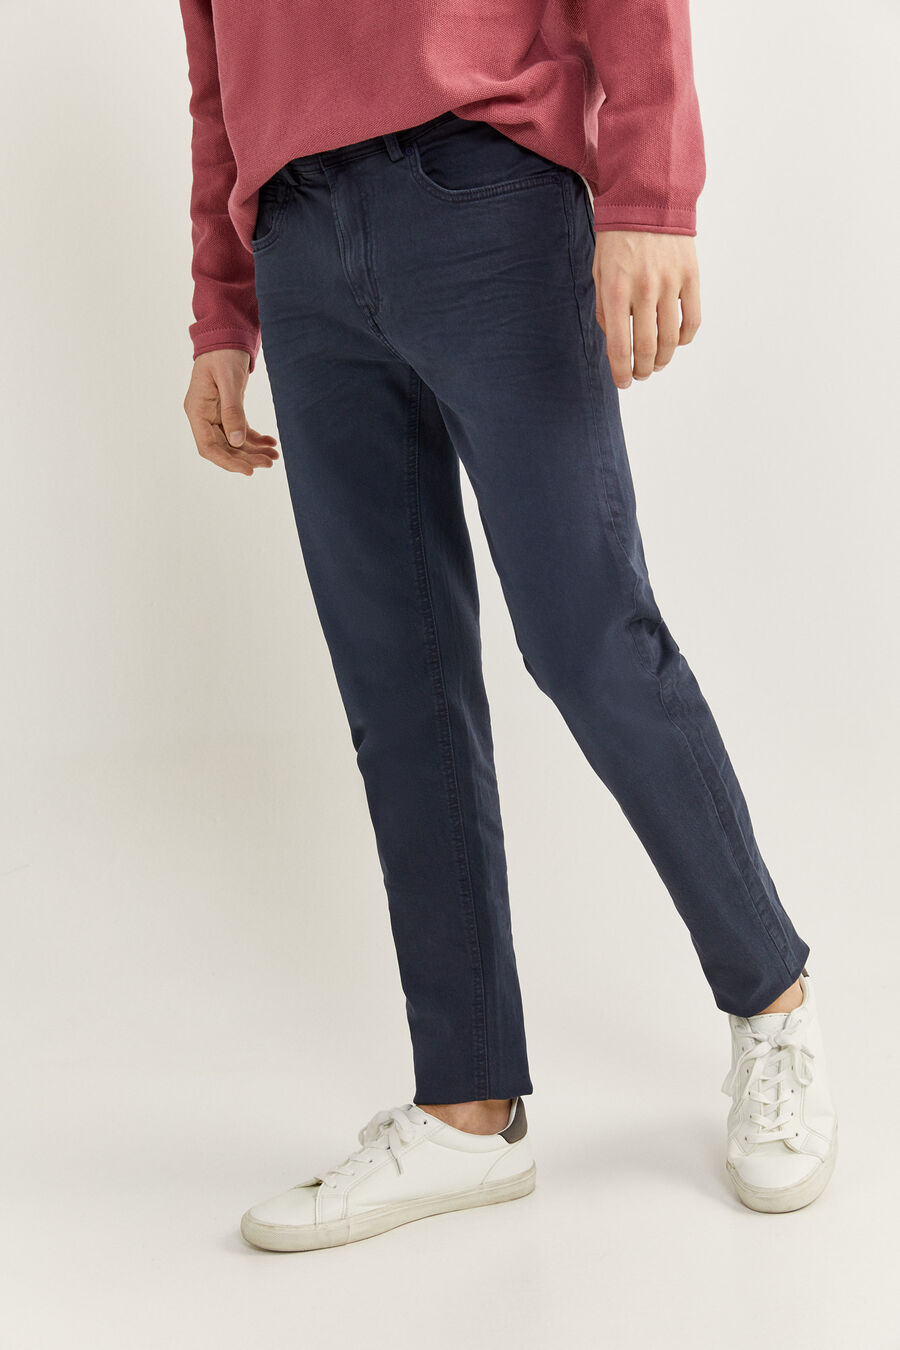 Pantalon 5 poches slim lavé